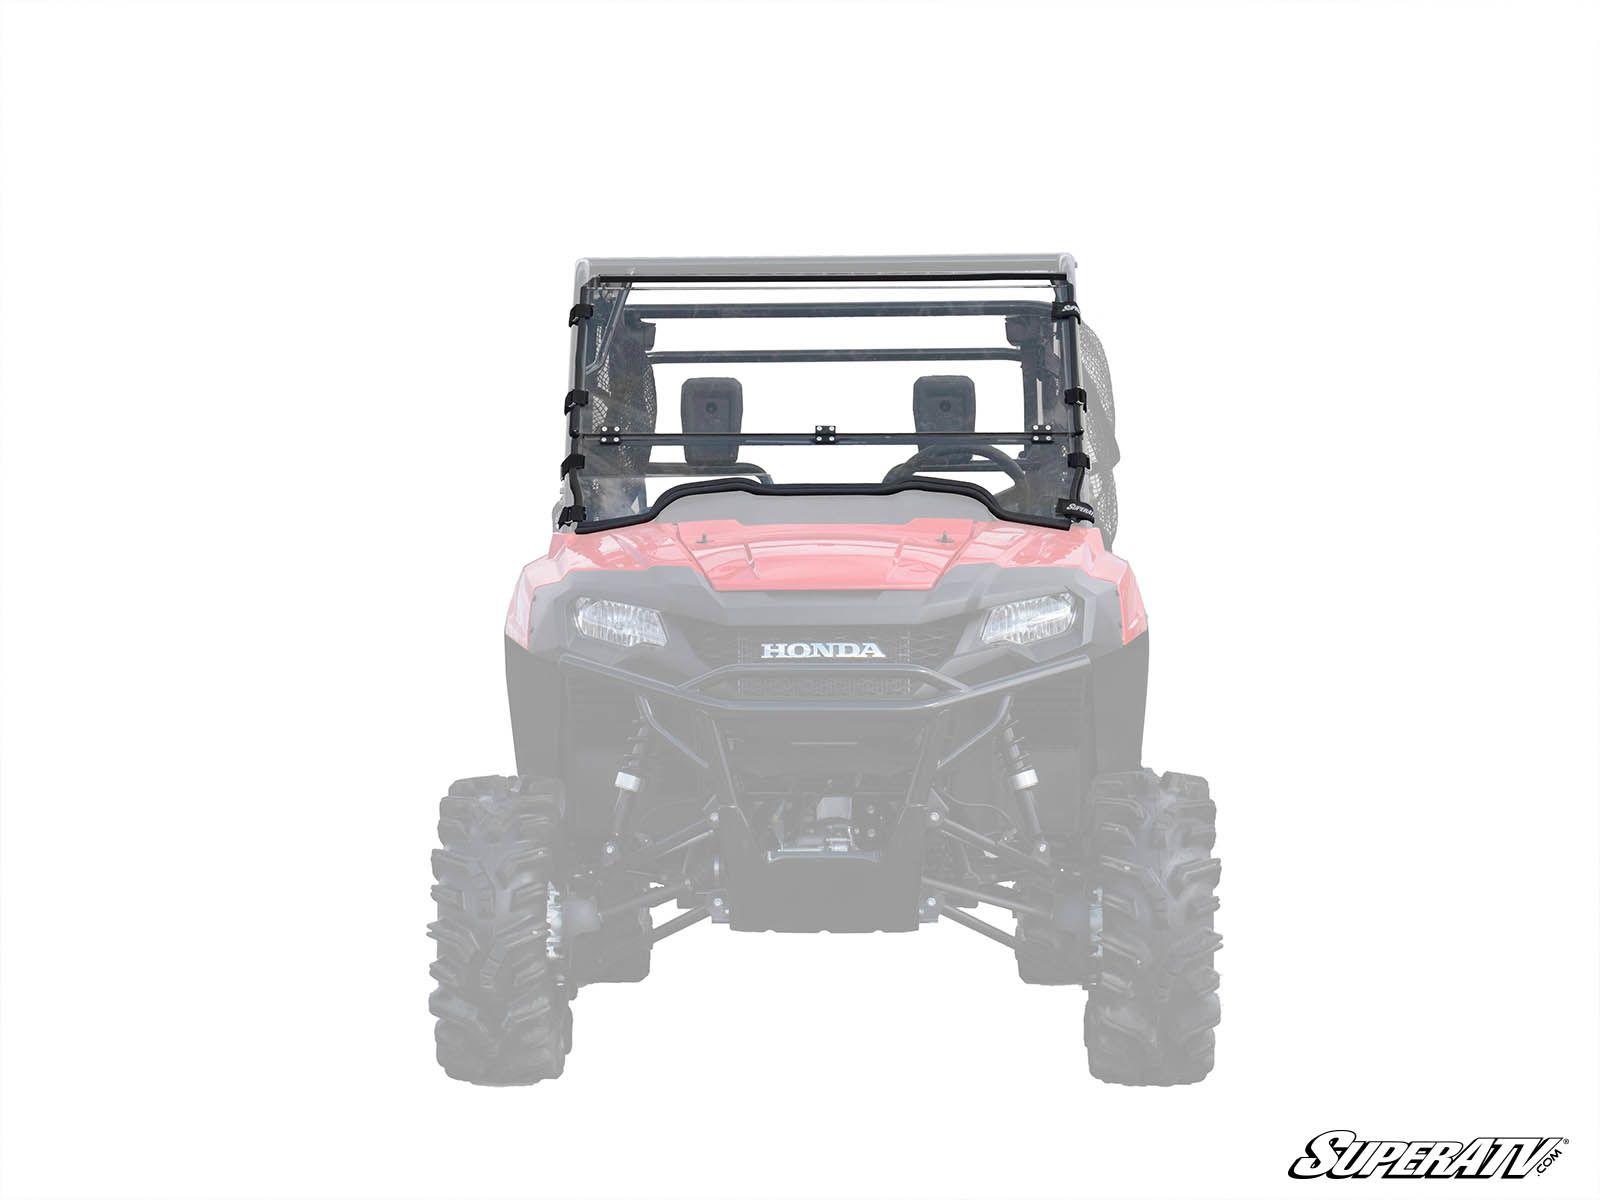 Super ATV Flip Down Scratch Resistant Windshield for Honda Pioneer 700